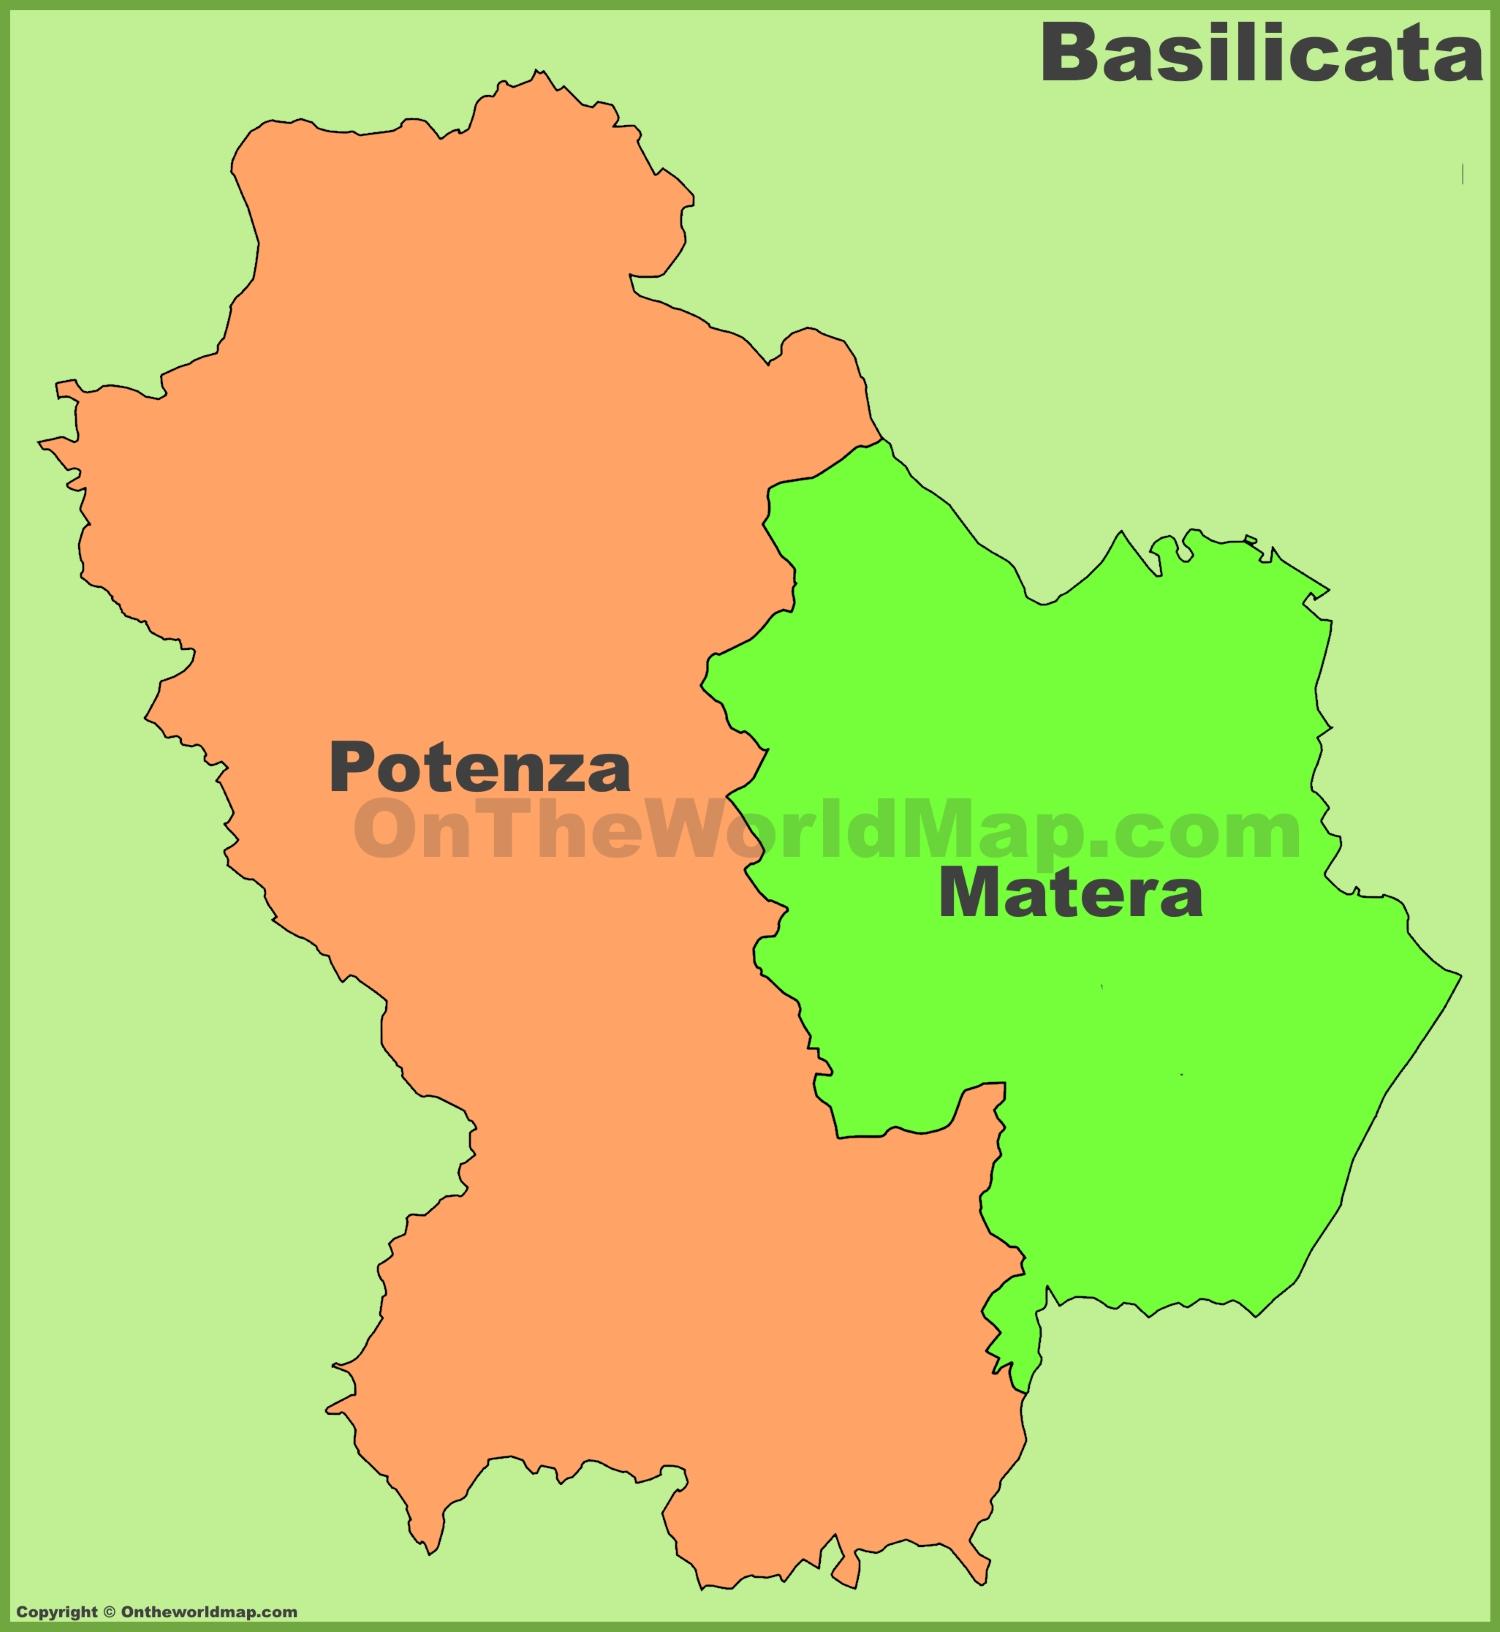 Basilicata provinces map